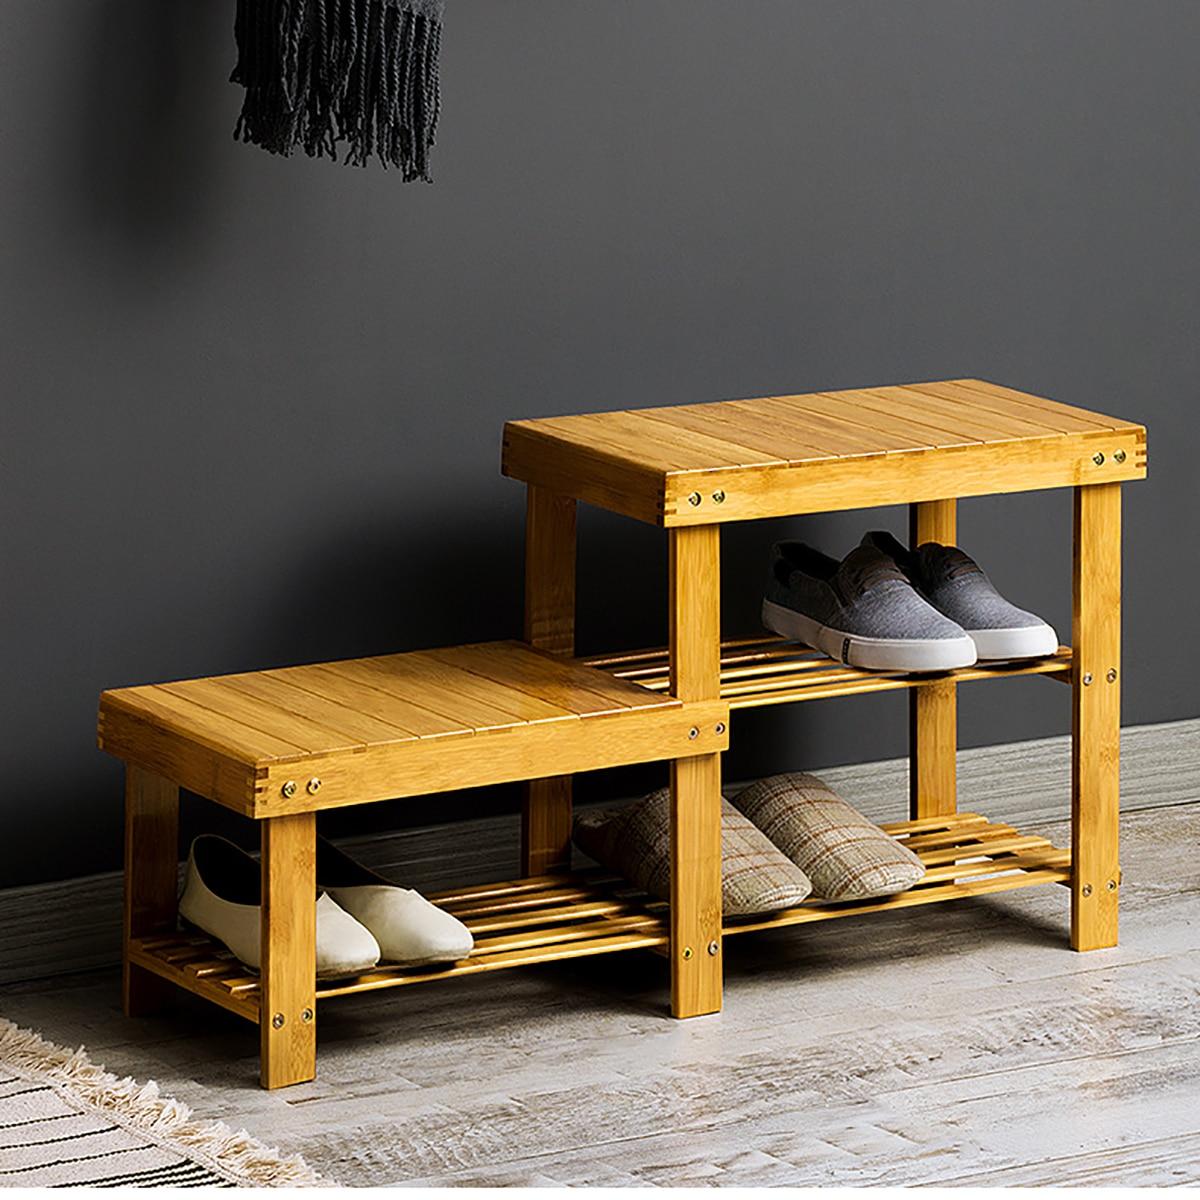 Wooden Multi Purpose Shoe Stools Shoe Rack Storage Benches Stools Porch Living Room door Convenient Multi Layer Shoe Organizer